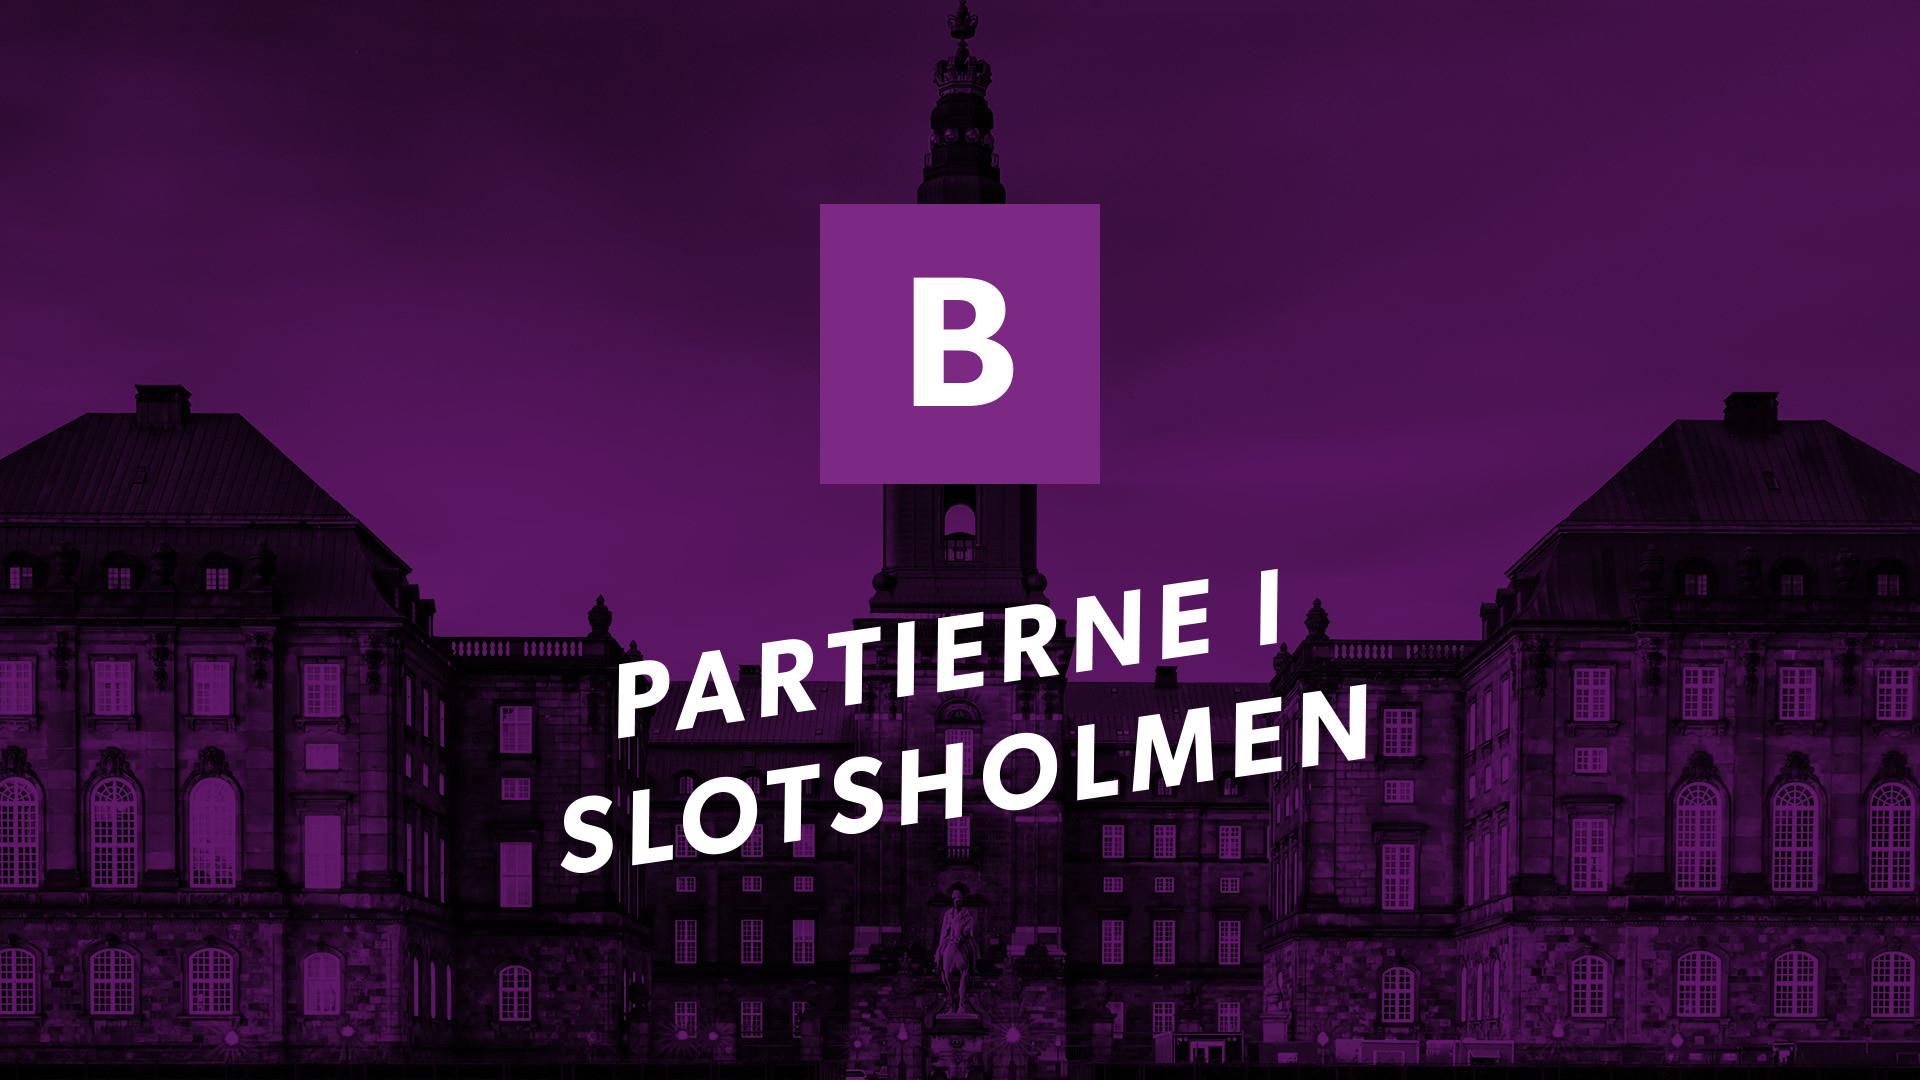 slotsholmen-radikale.jpg